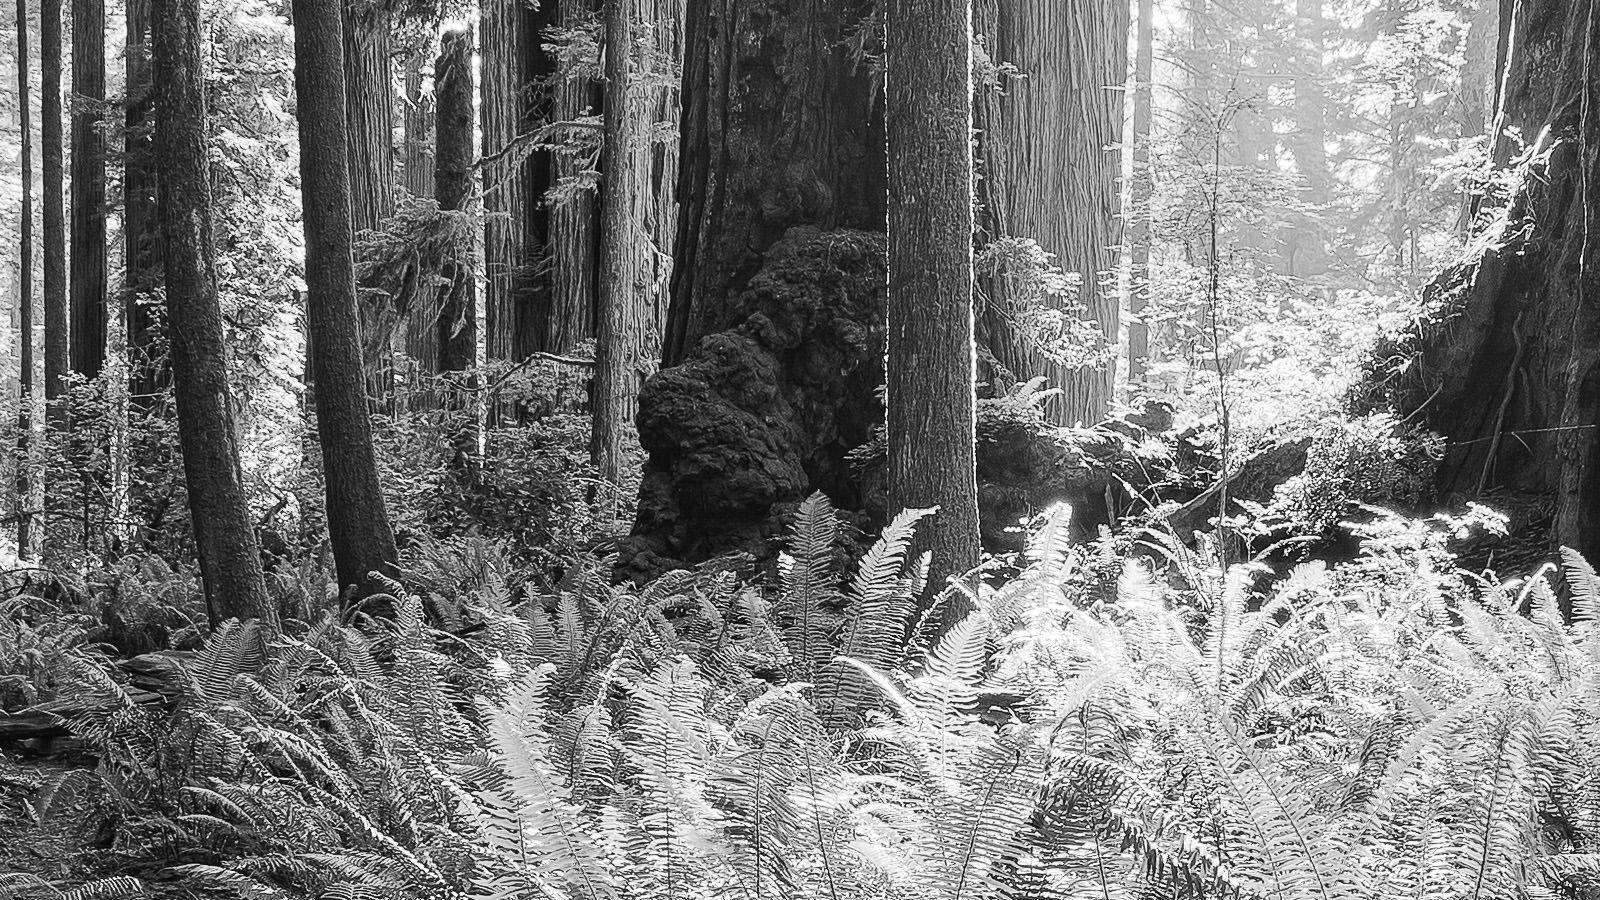 Redwoods Detail - Californian Redwoods, California Black & White Fine Art Photography